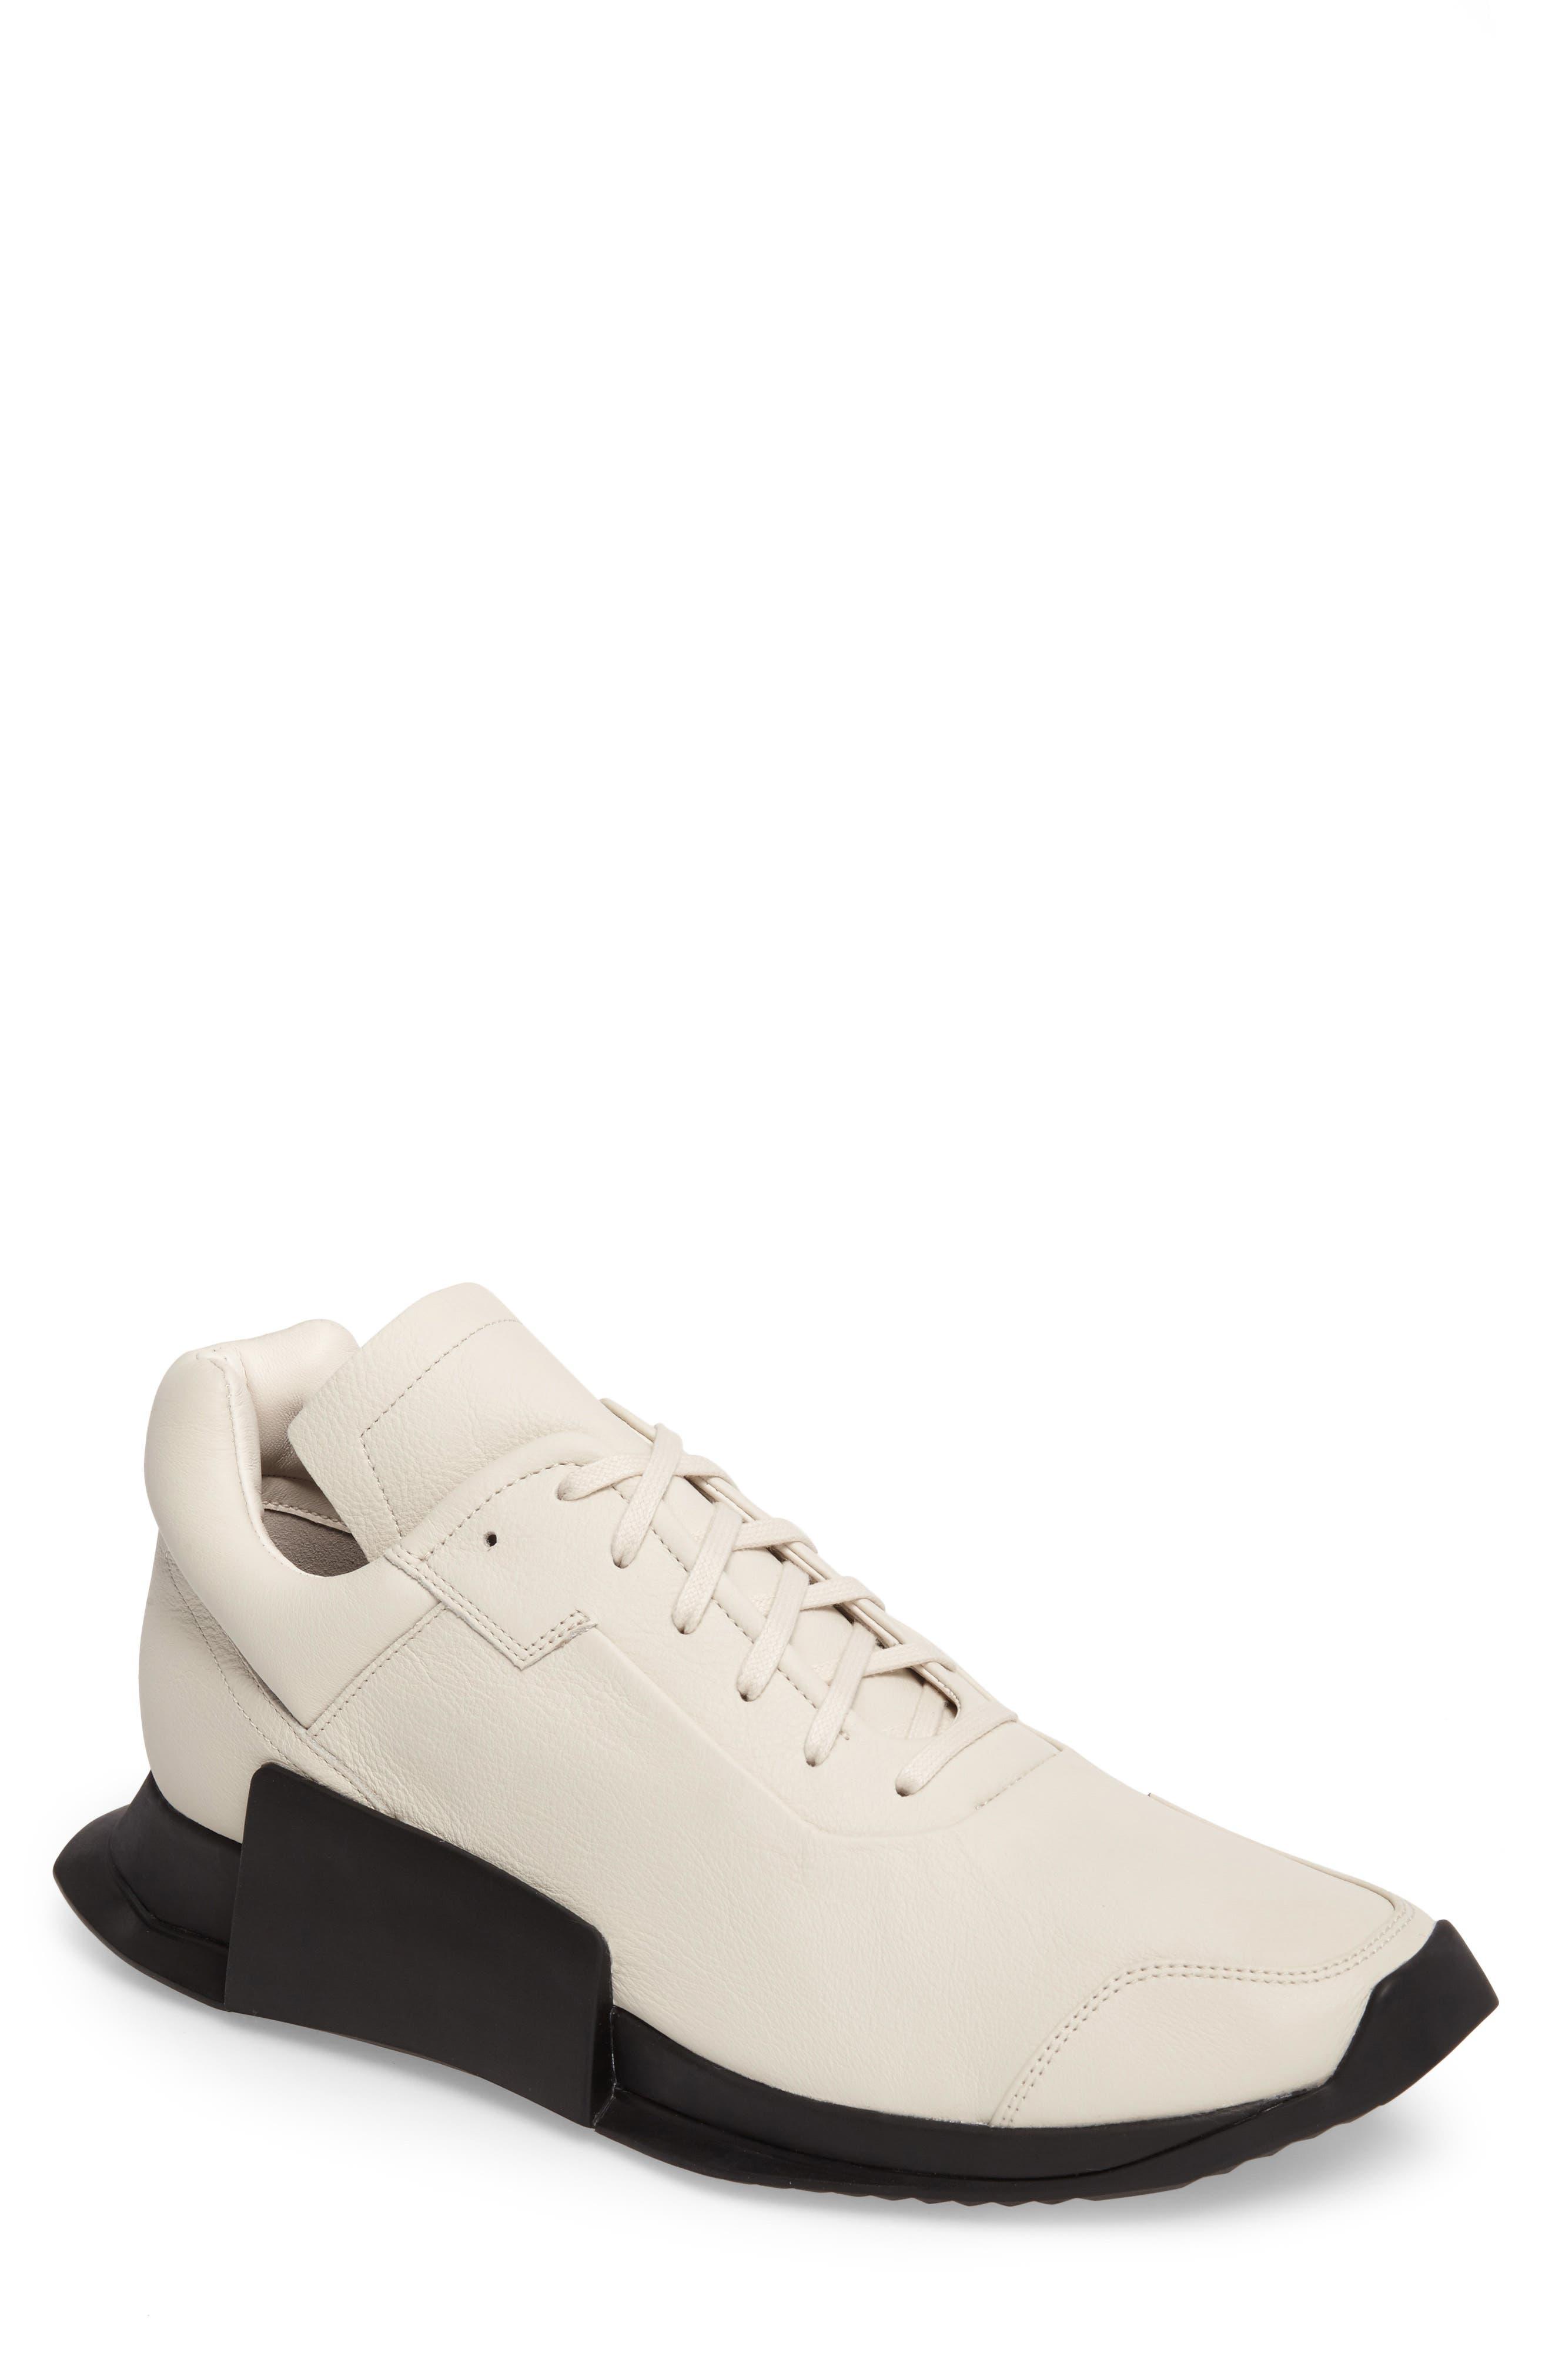 Rick Owens by adidas New Runner Boost Sneaker (Men)